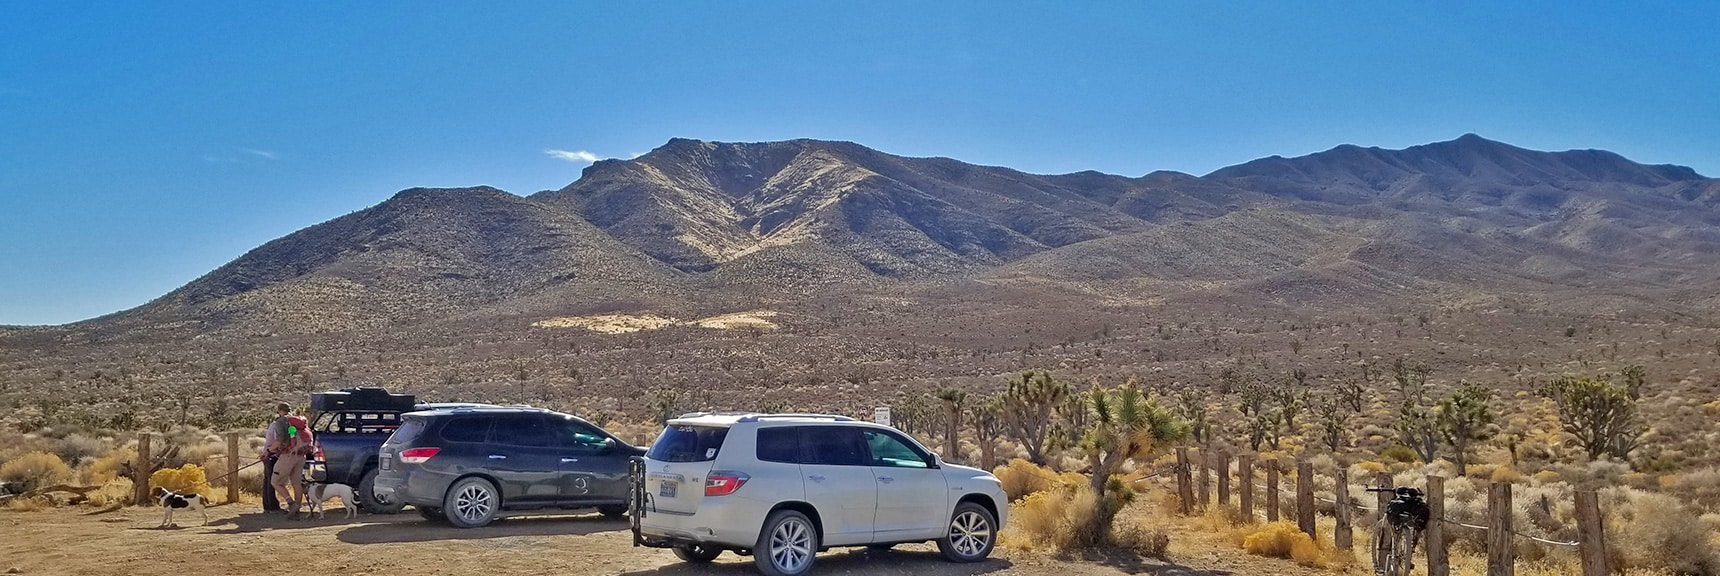 Gass Peak Trailhead on Gass Peak Road | Gass Peak Road Circuit | Desert National Wildlife Refuge | Nevada